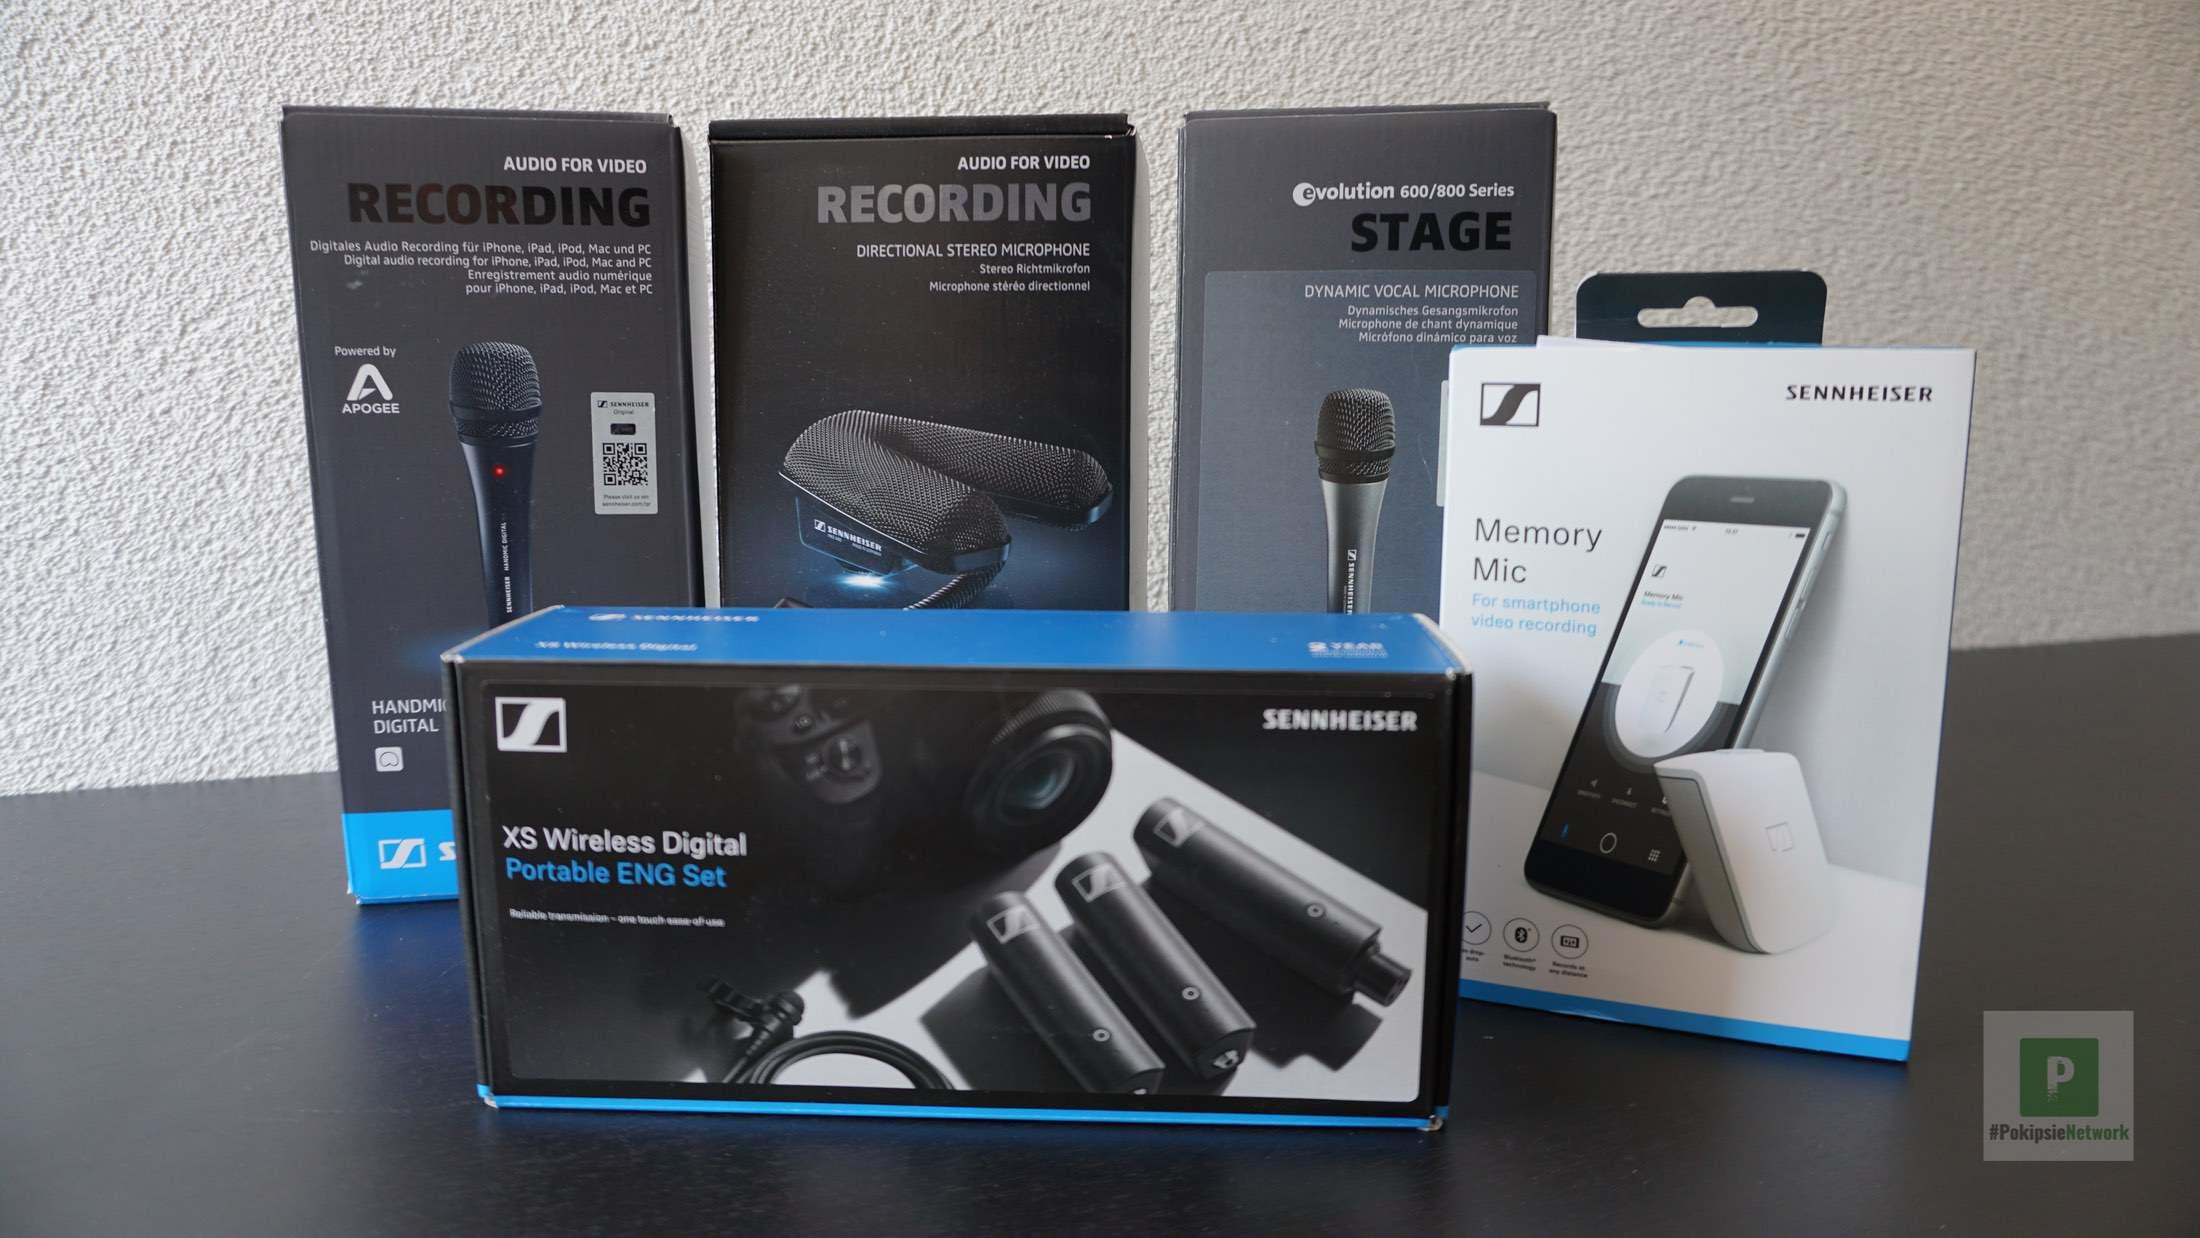 Sennheiser Mikrofon Gadgets – Handmikrofon, Funkstrecke und VLOG Lösung